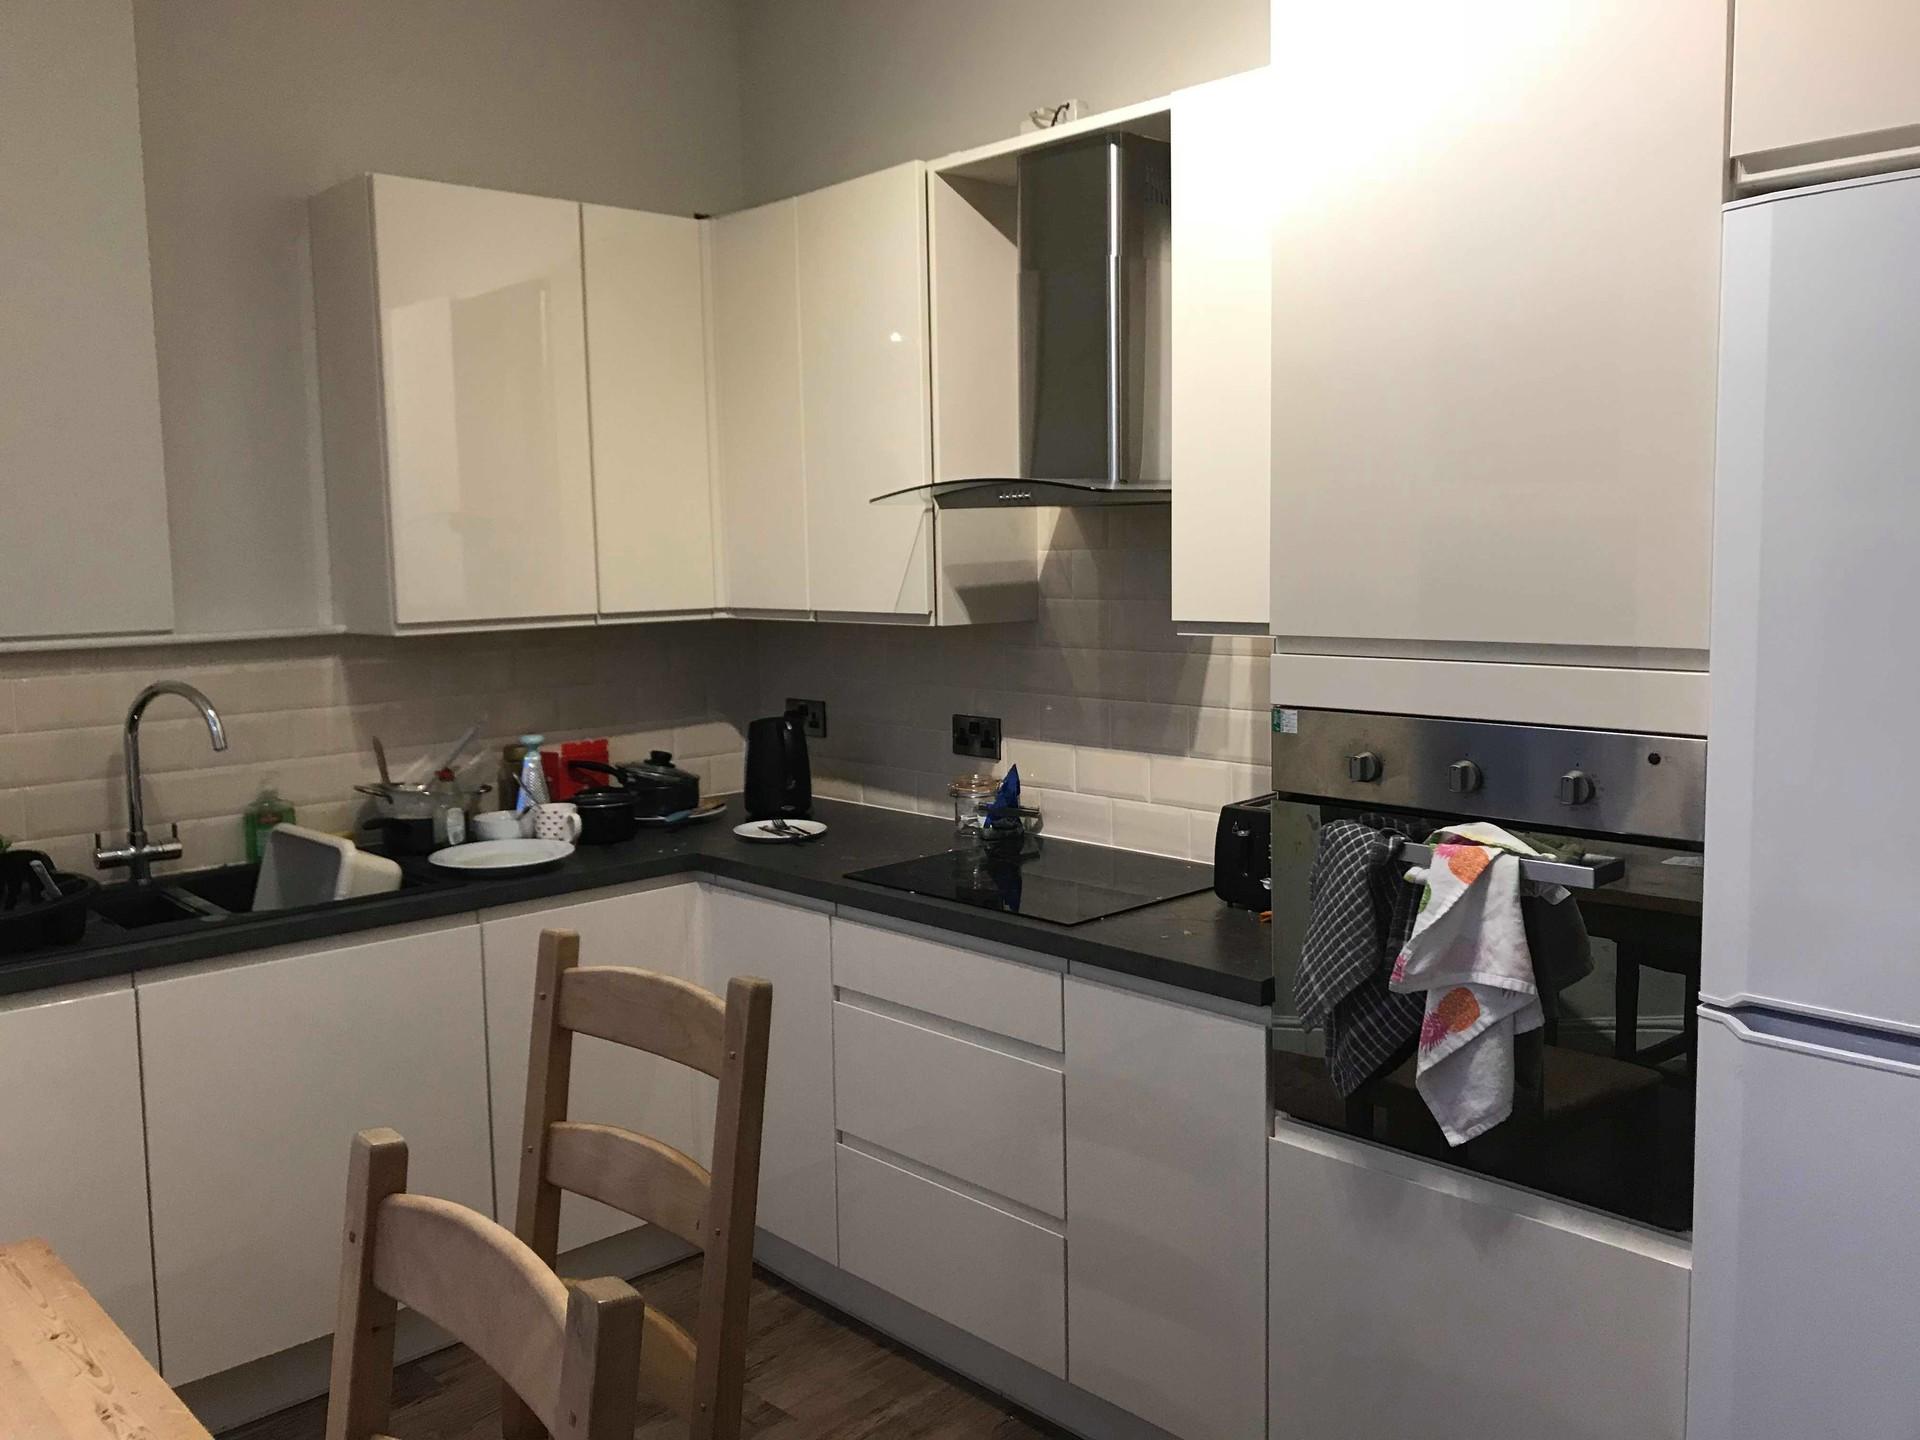 lovely-room-sheffield-uk-semester-2-rent-88-week-6e54528abf96c72b340d1e1b7bca5caf